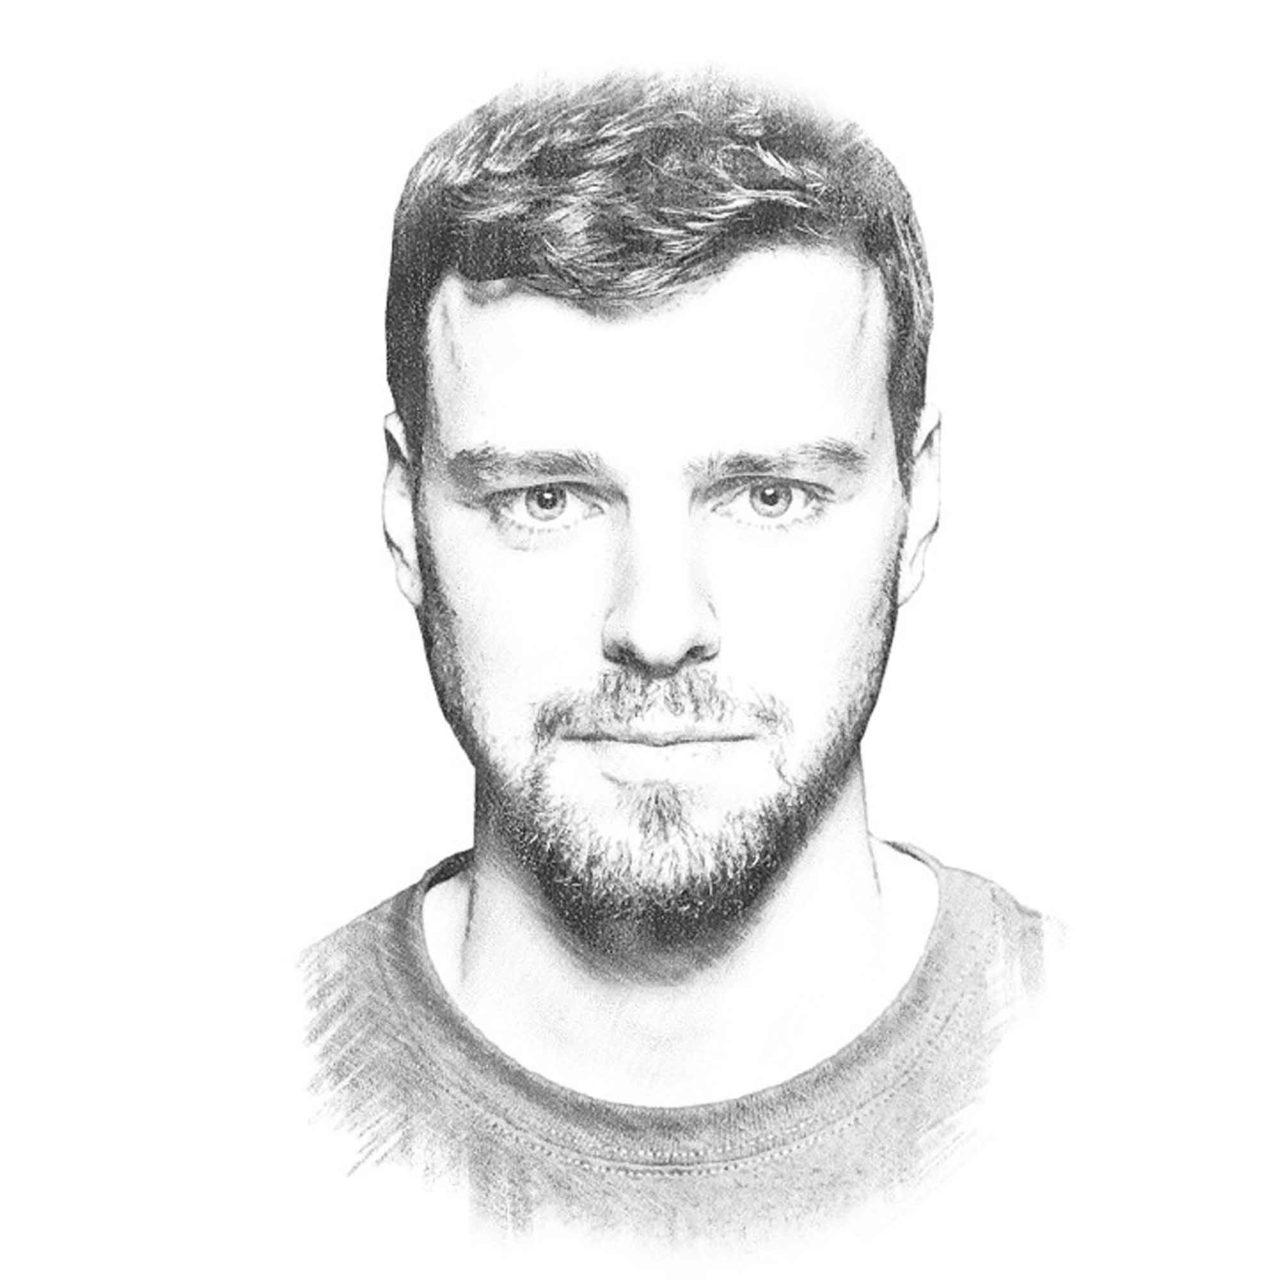 http://www.snackondesign.com/wp-content/uploads/2018/06/Gabriel-Landers-1280x1280.jpg